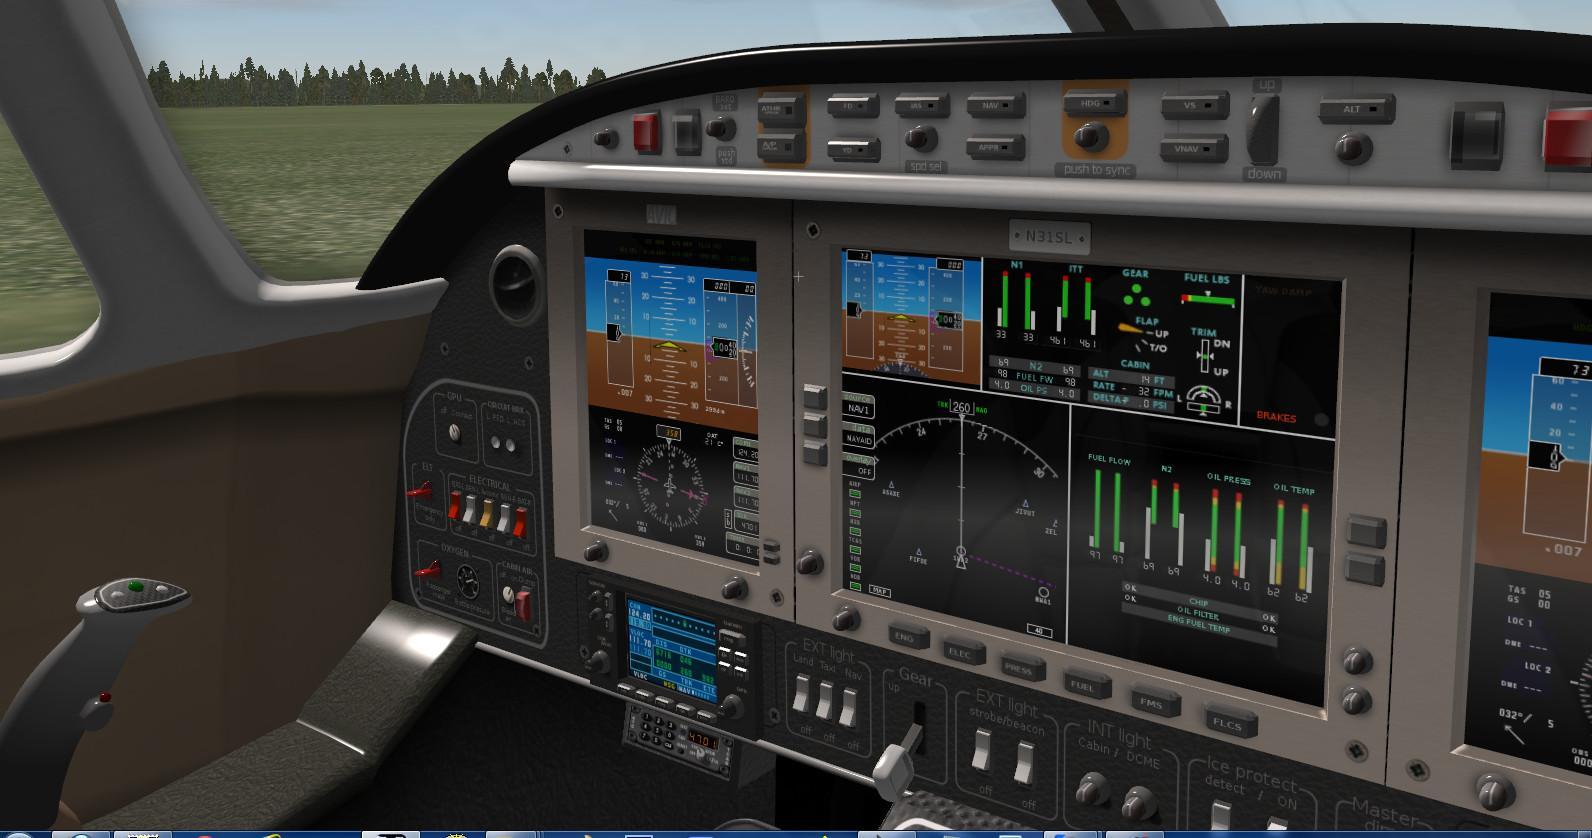 X Plane 10 Cockpit – HD Wallpapers